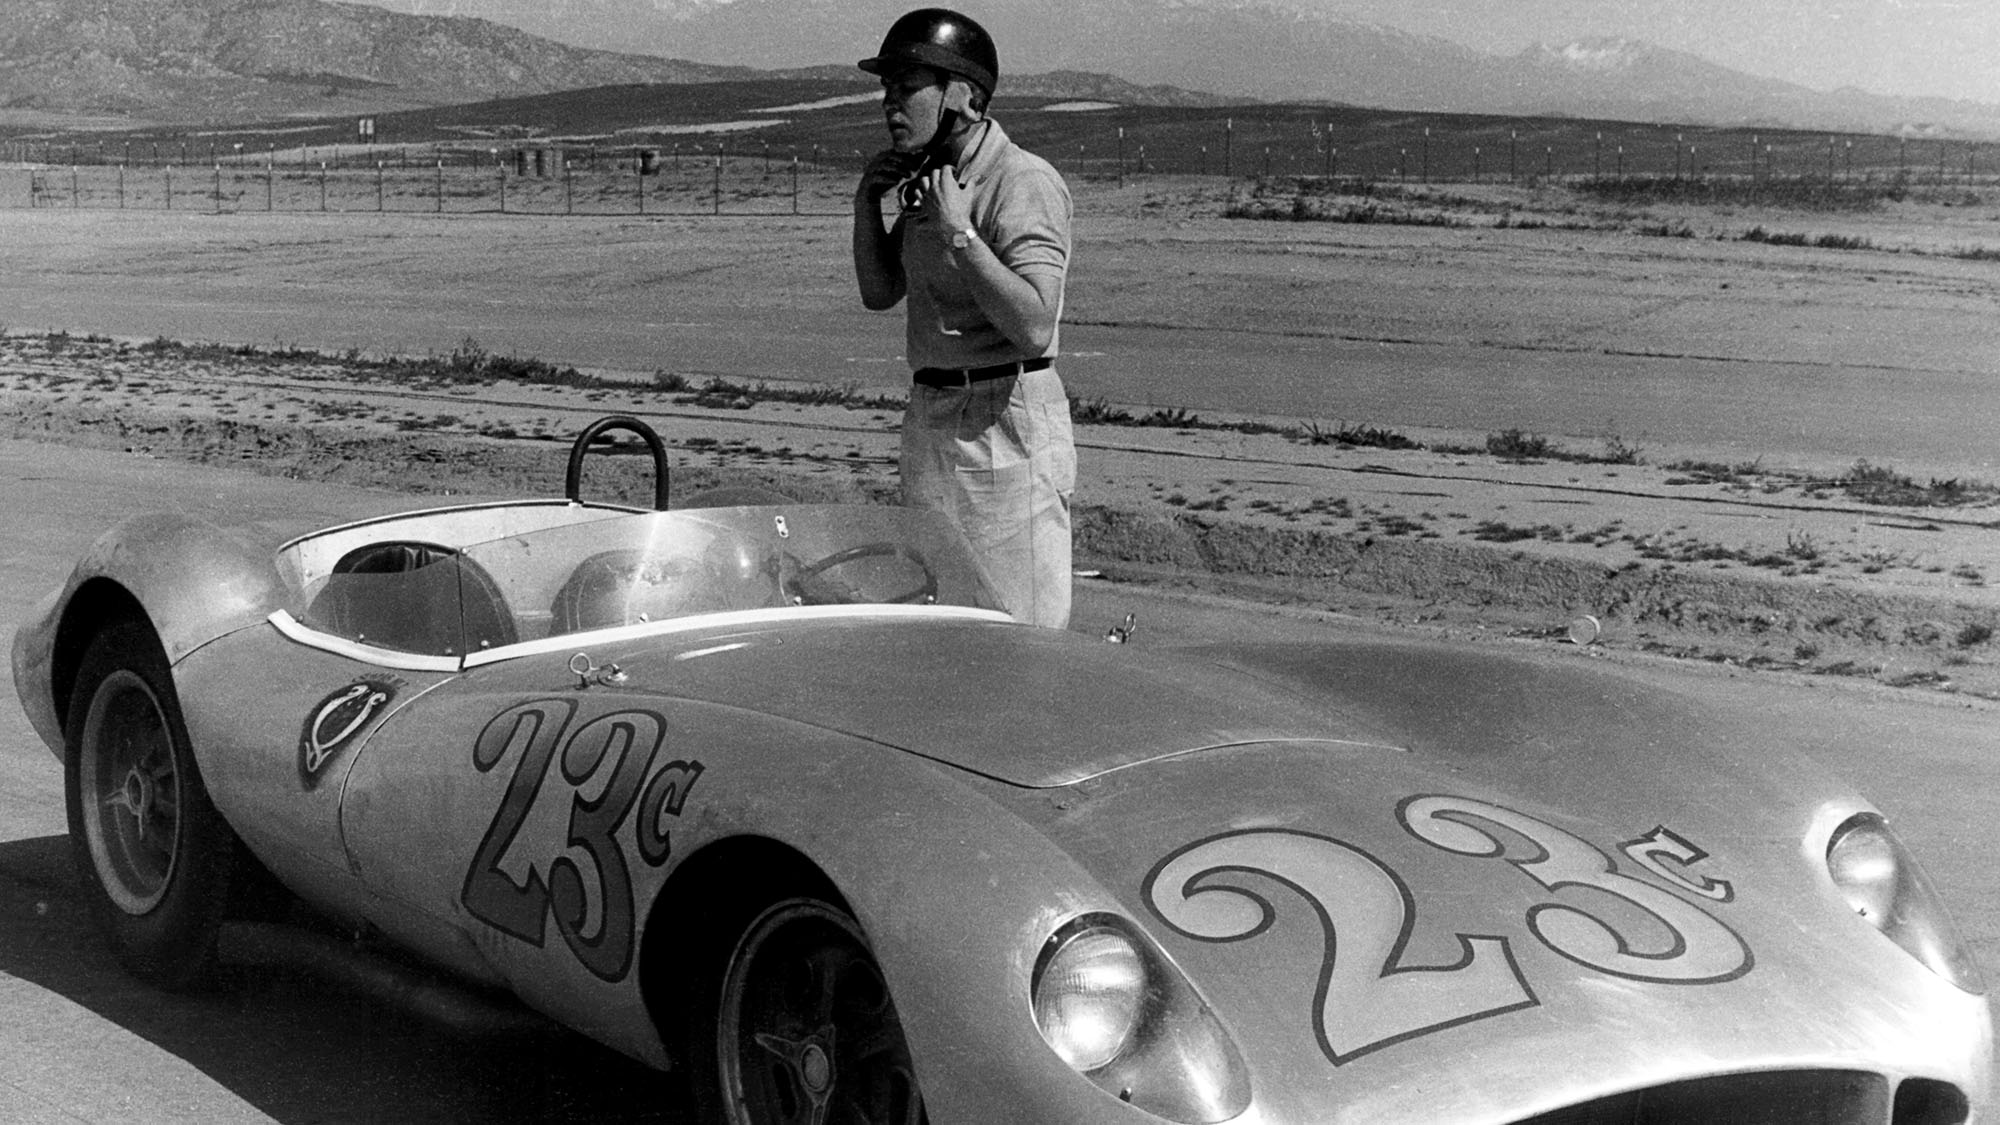 Lance Reventlow, Scarab roadster, Testing, Riverside International Raceway, 11 January 1958. Lance Reventlow testing his Scarab roadster at Riverside race track. (Photo by Bernard Cahier/Getty Images)